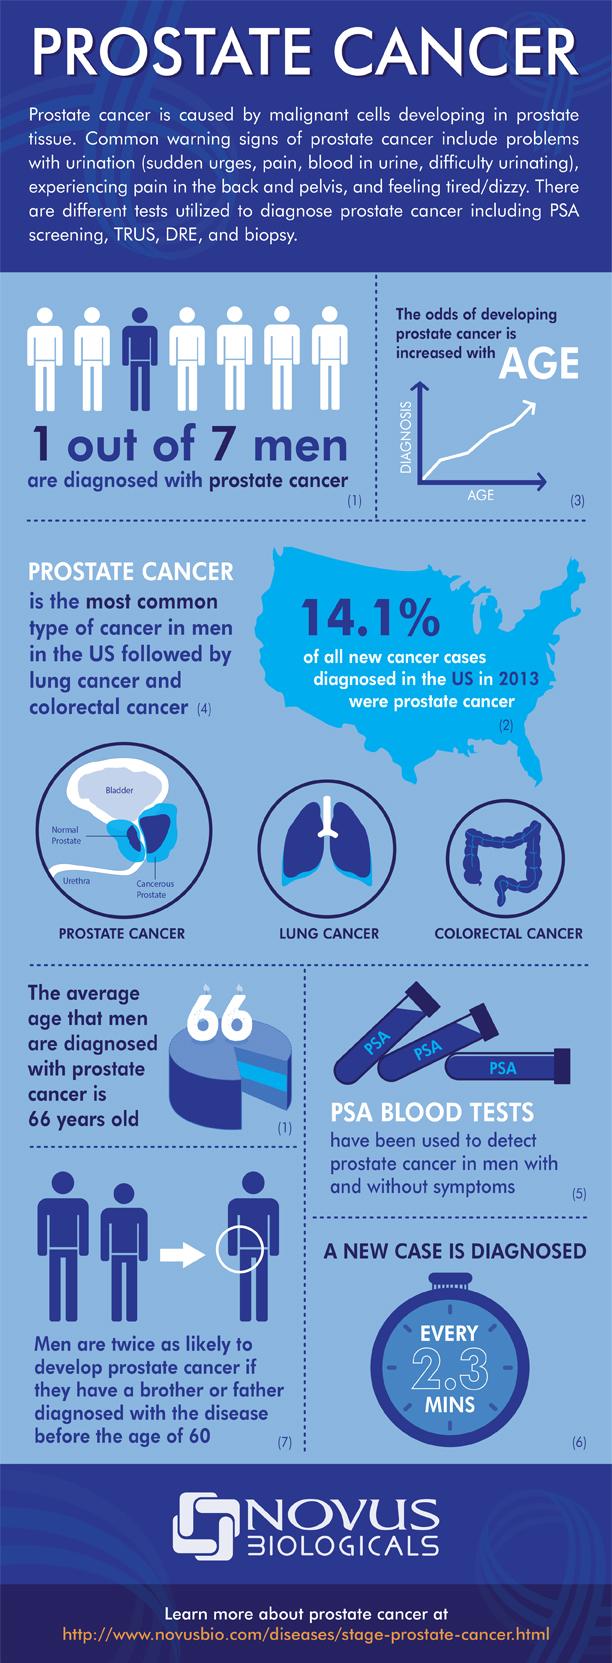 Prostate Caner Infographic